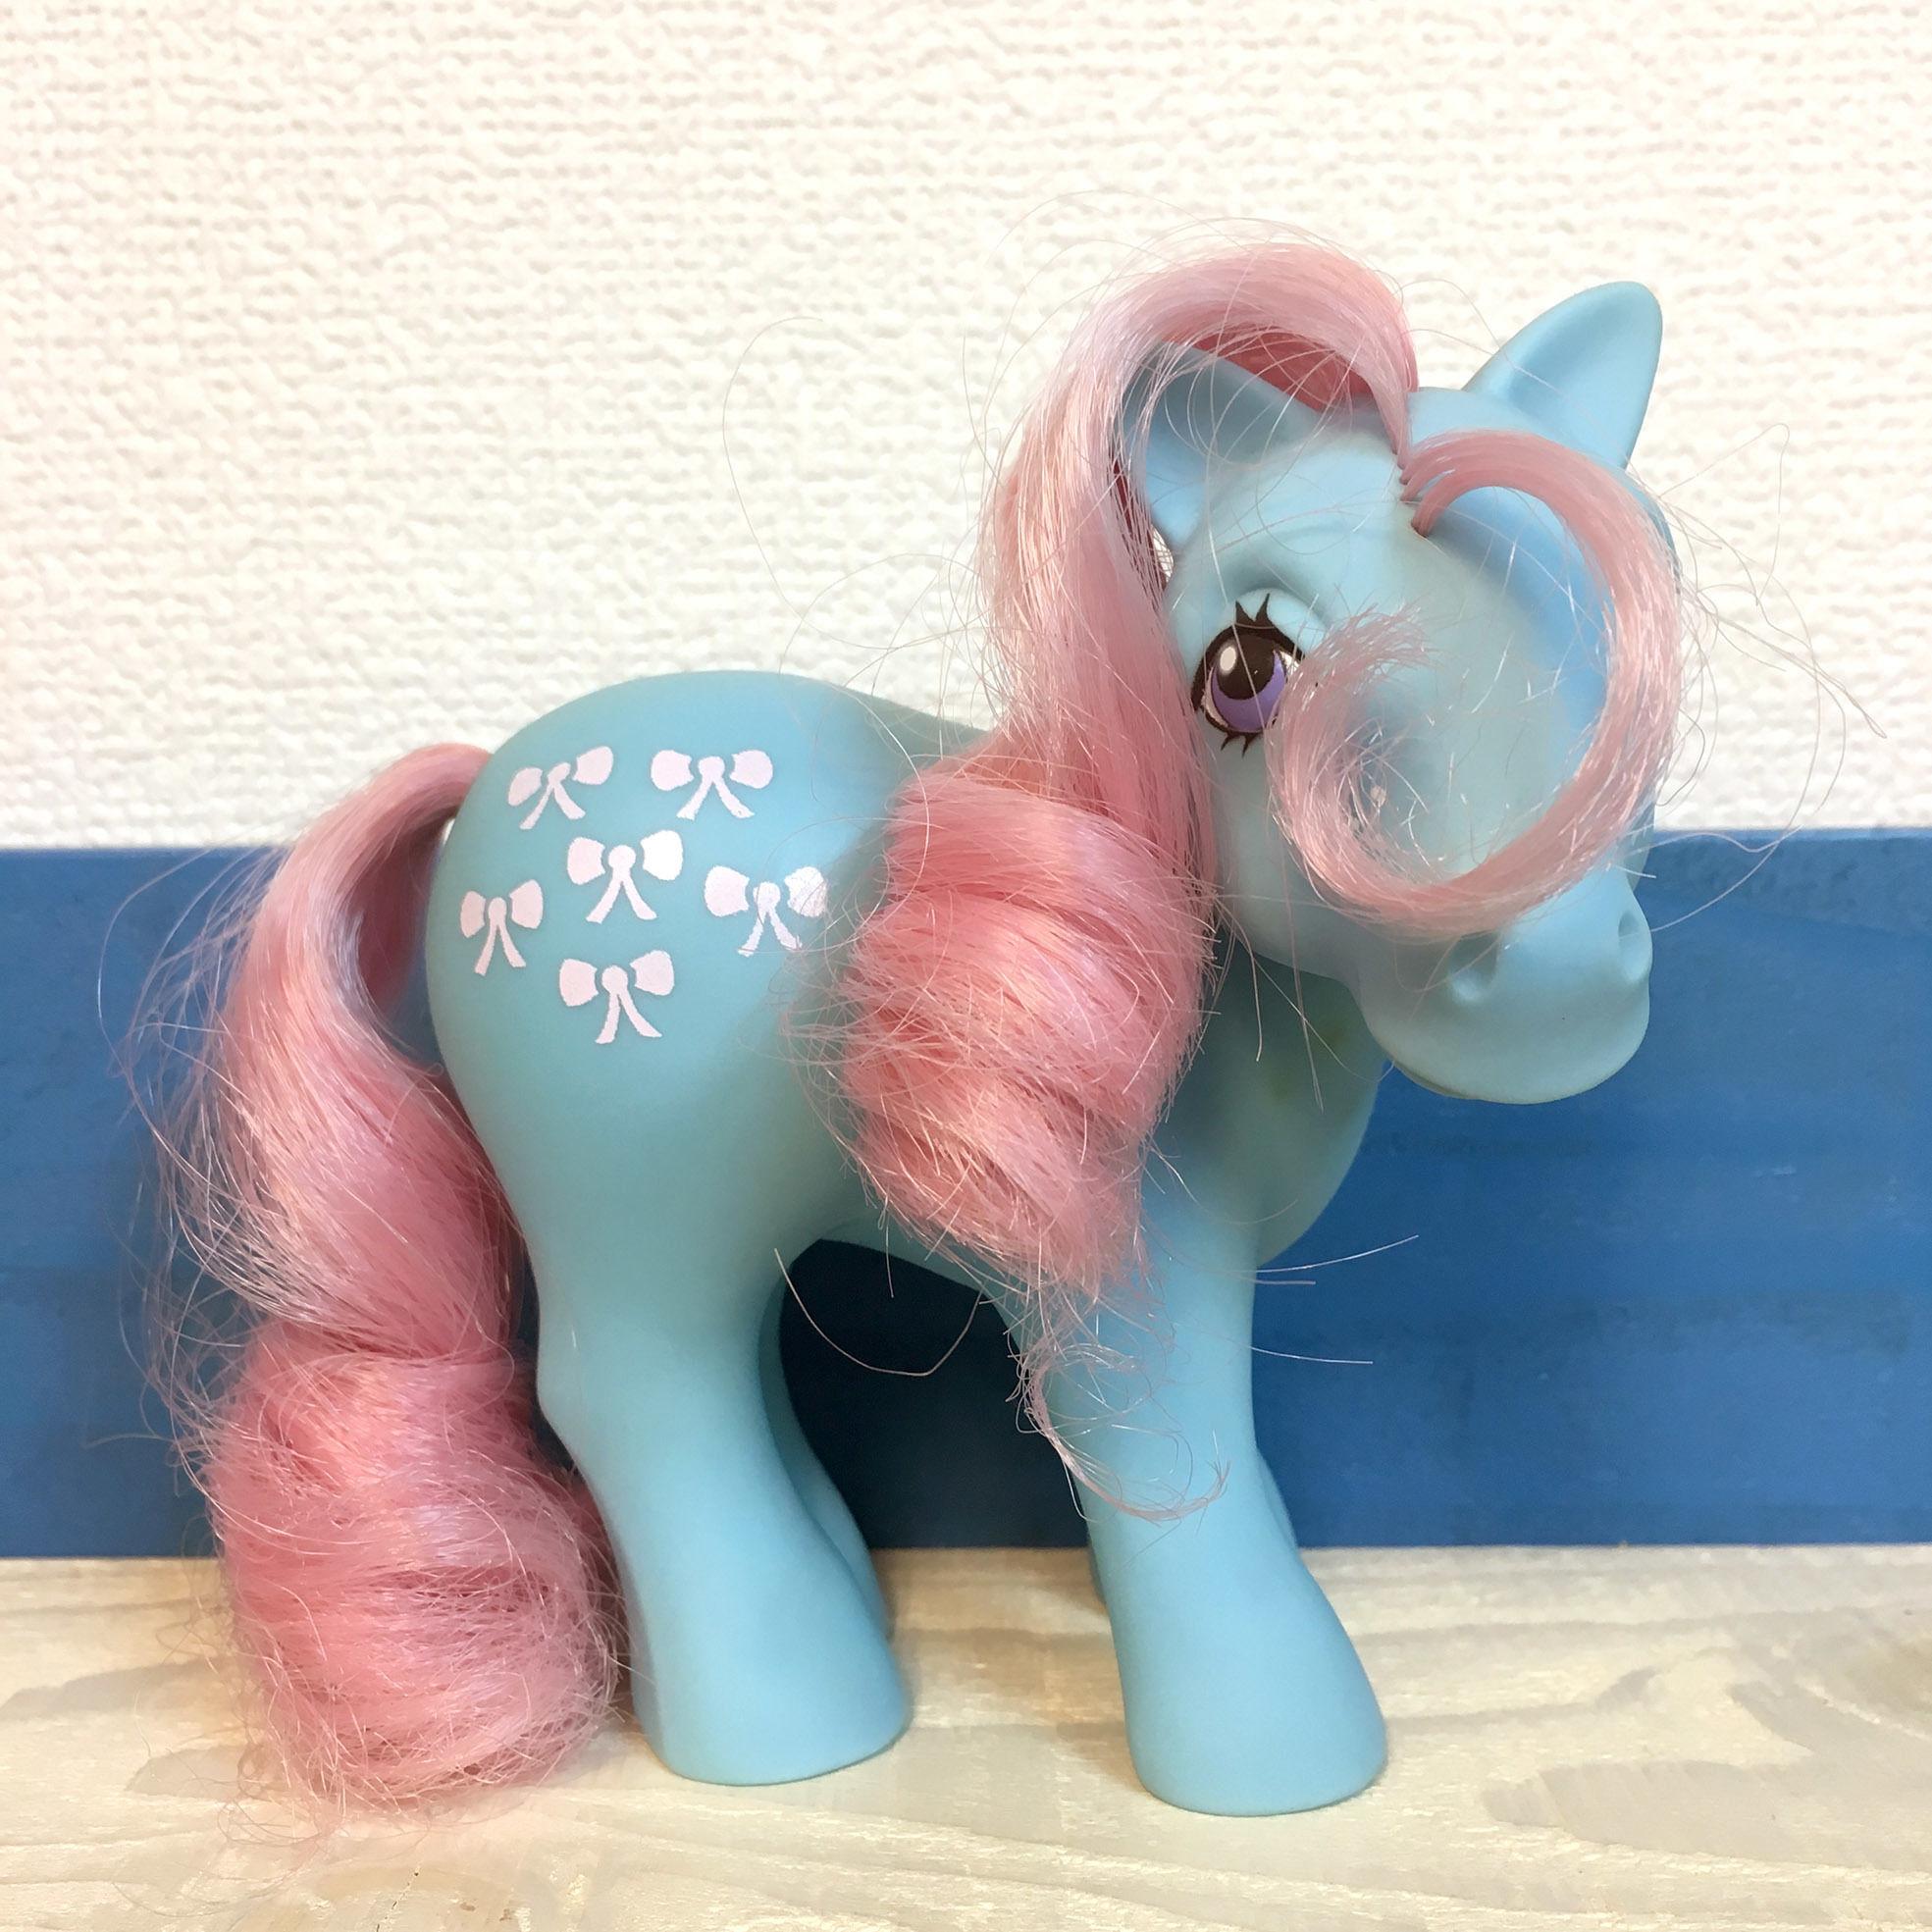 G1 My Little Pony Bowtie/G1マイリトルポニー ボウタイ/171103-5